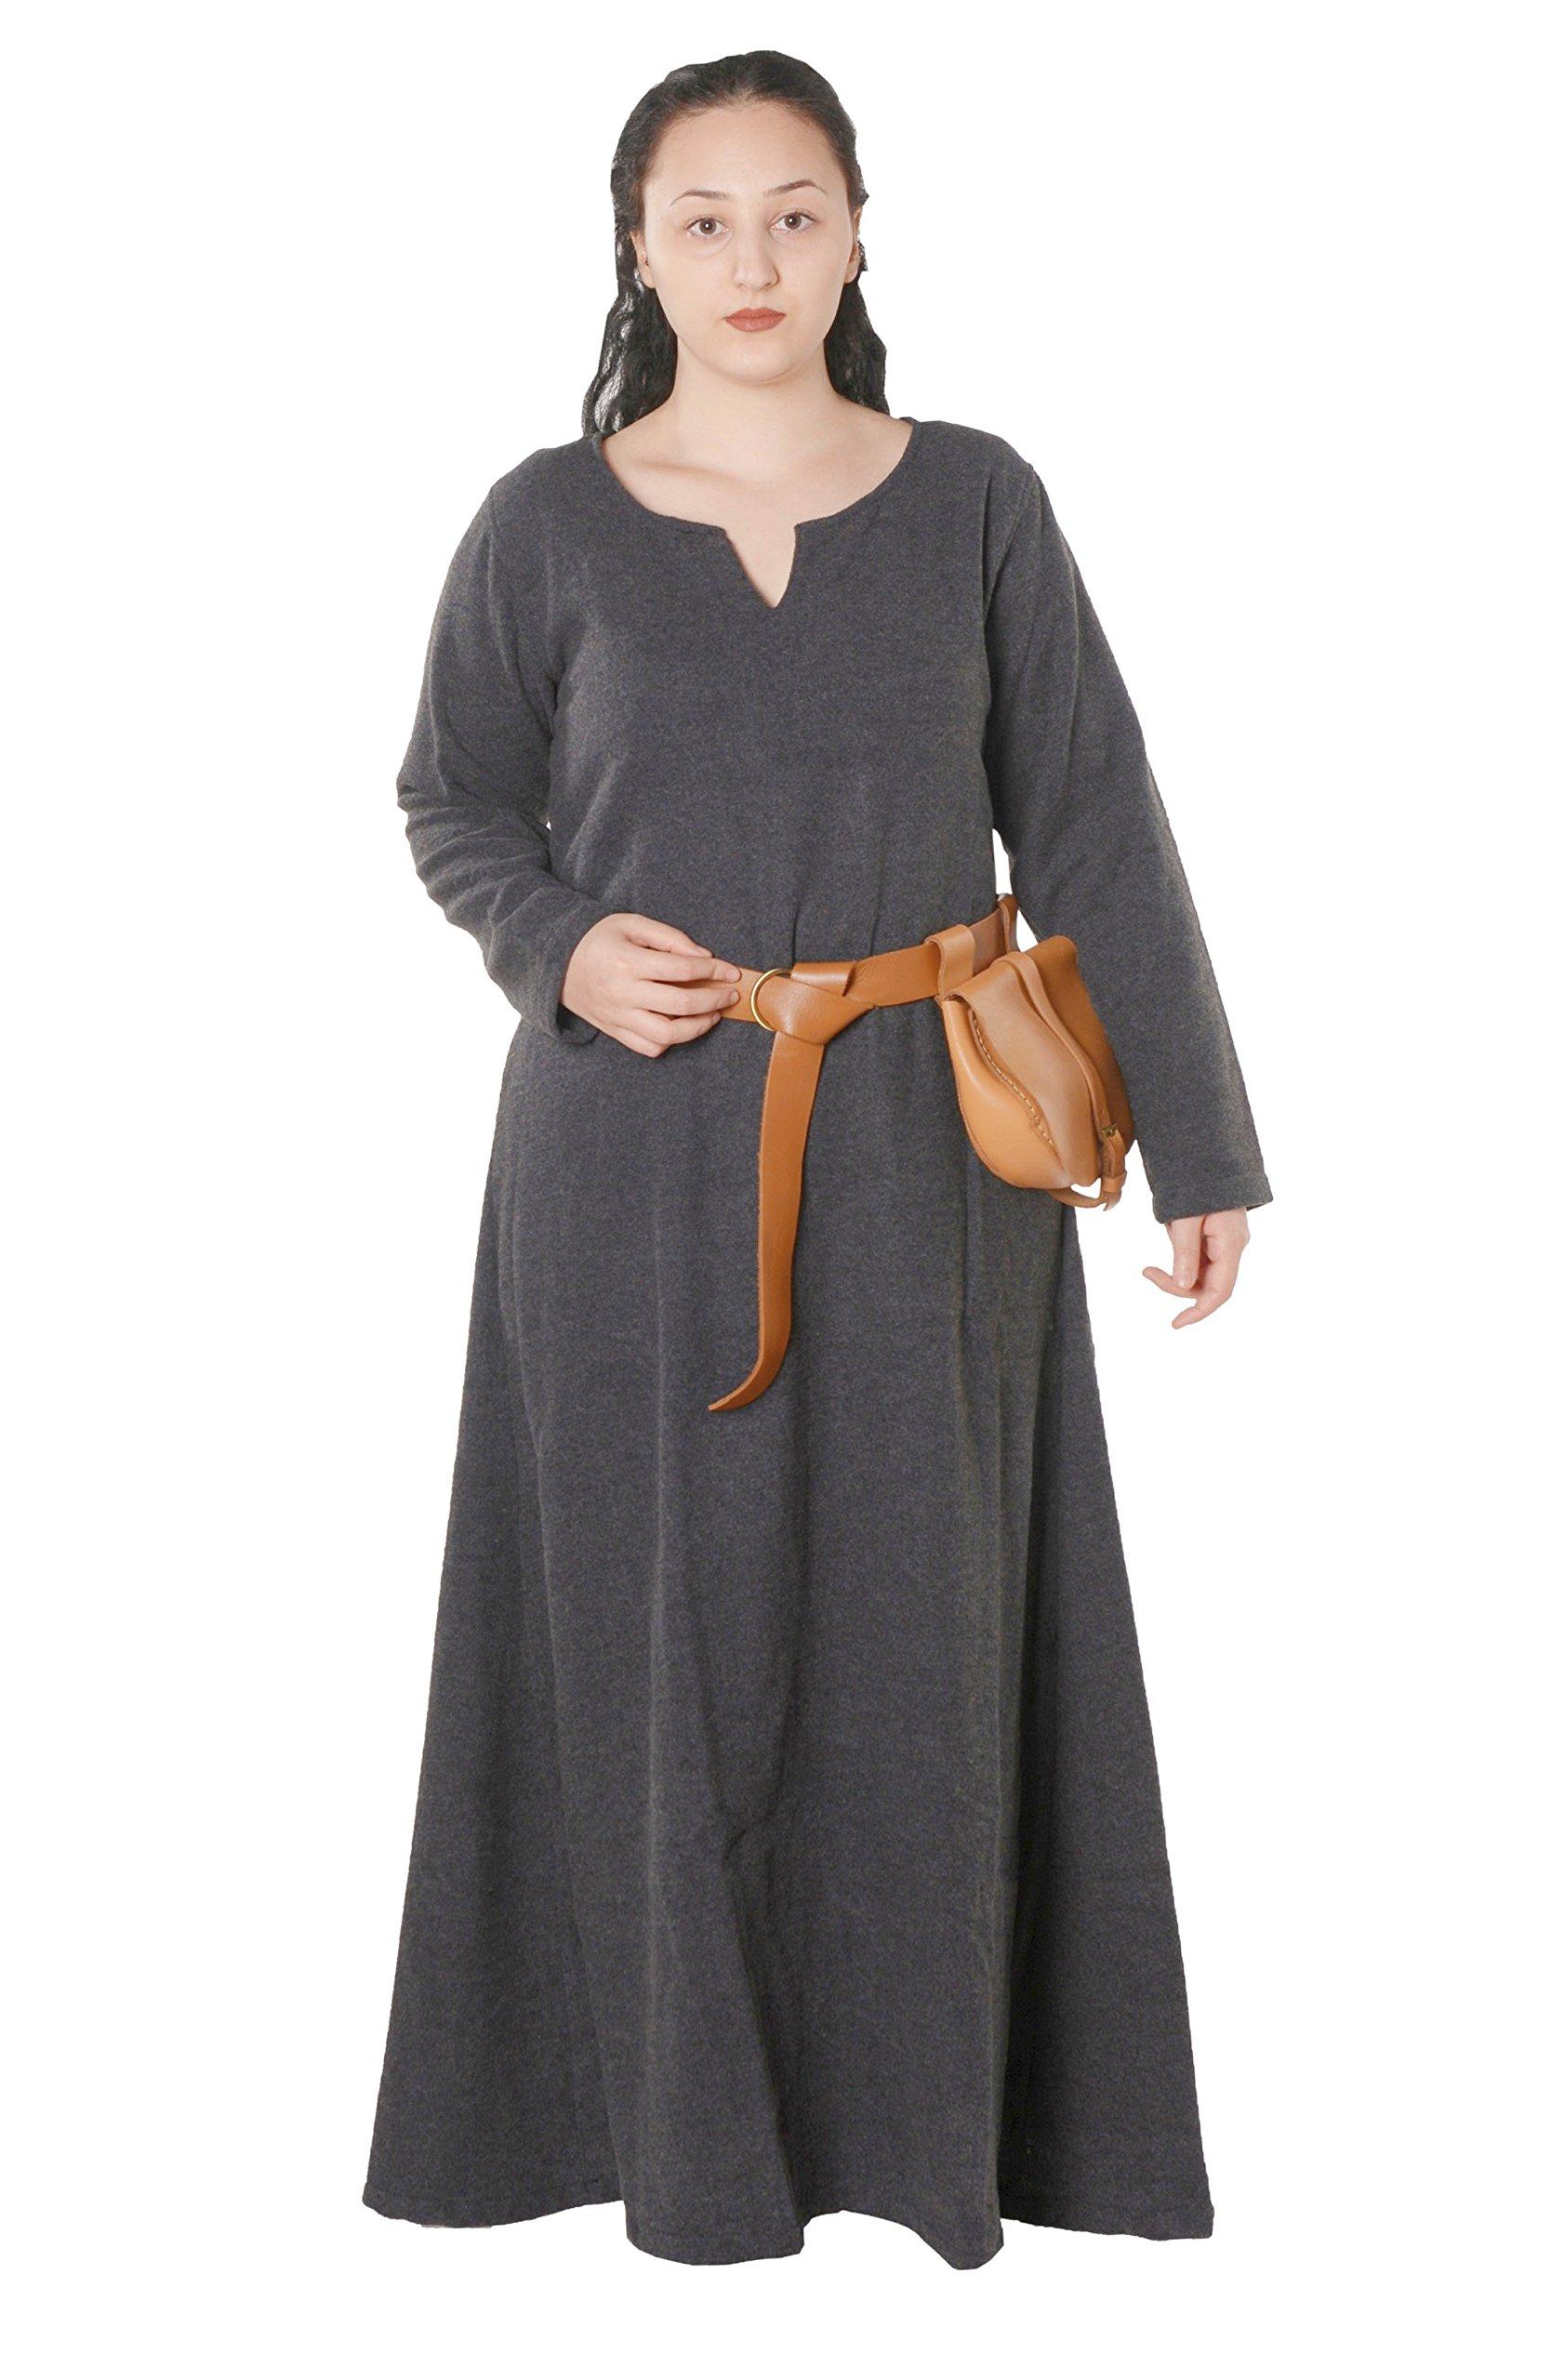 Wilma Medieval Viking Wool Dress by Calvina Costumes - Made in Turkey, Dark Grey, XXX-Large